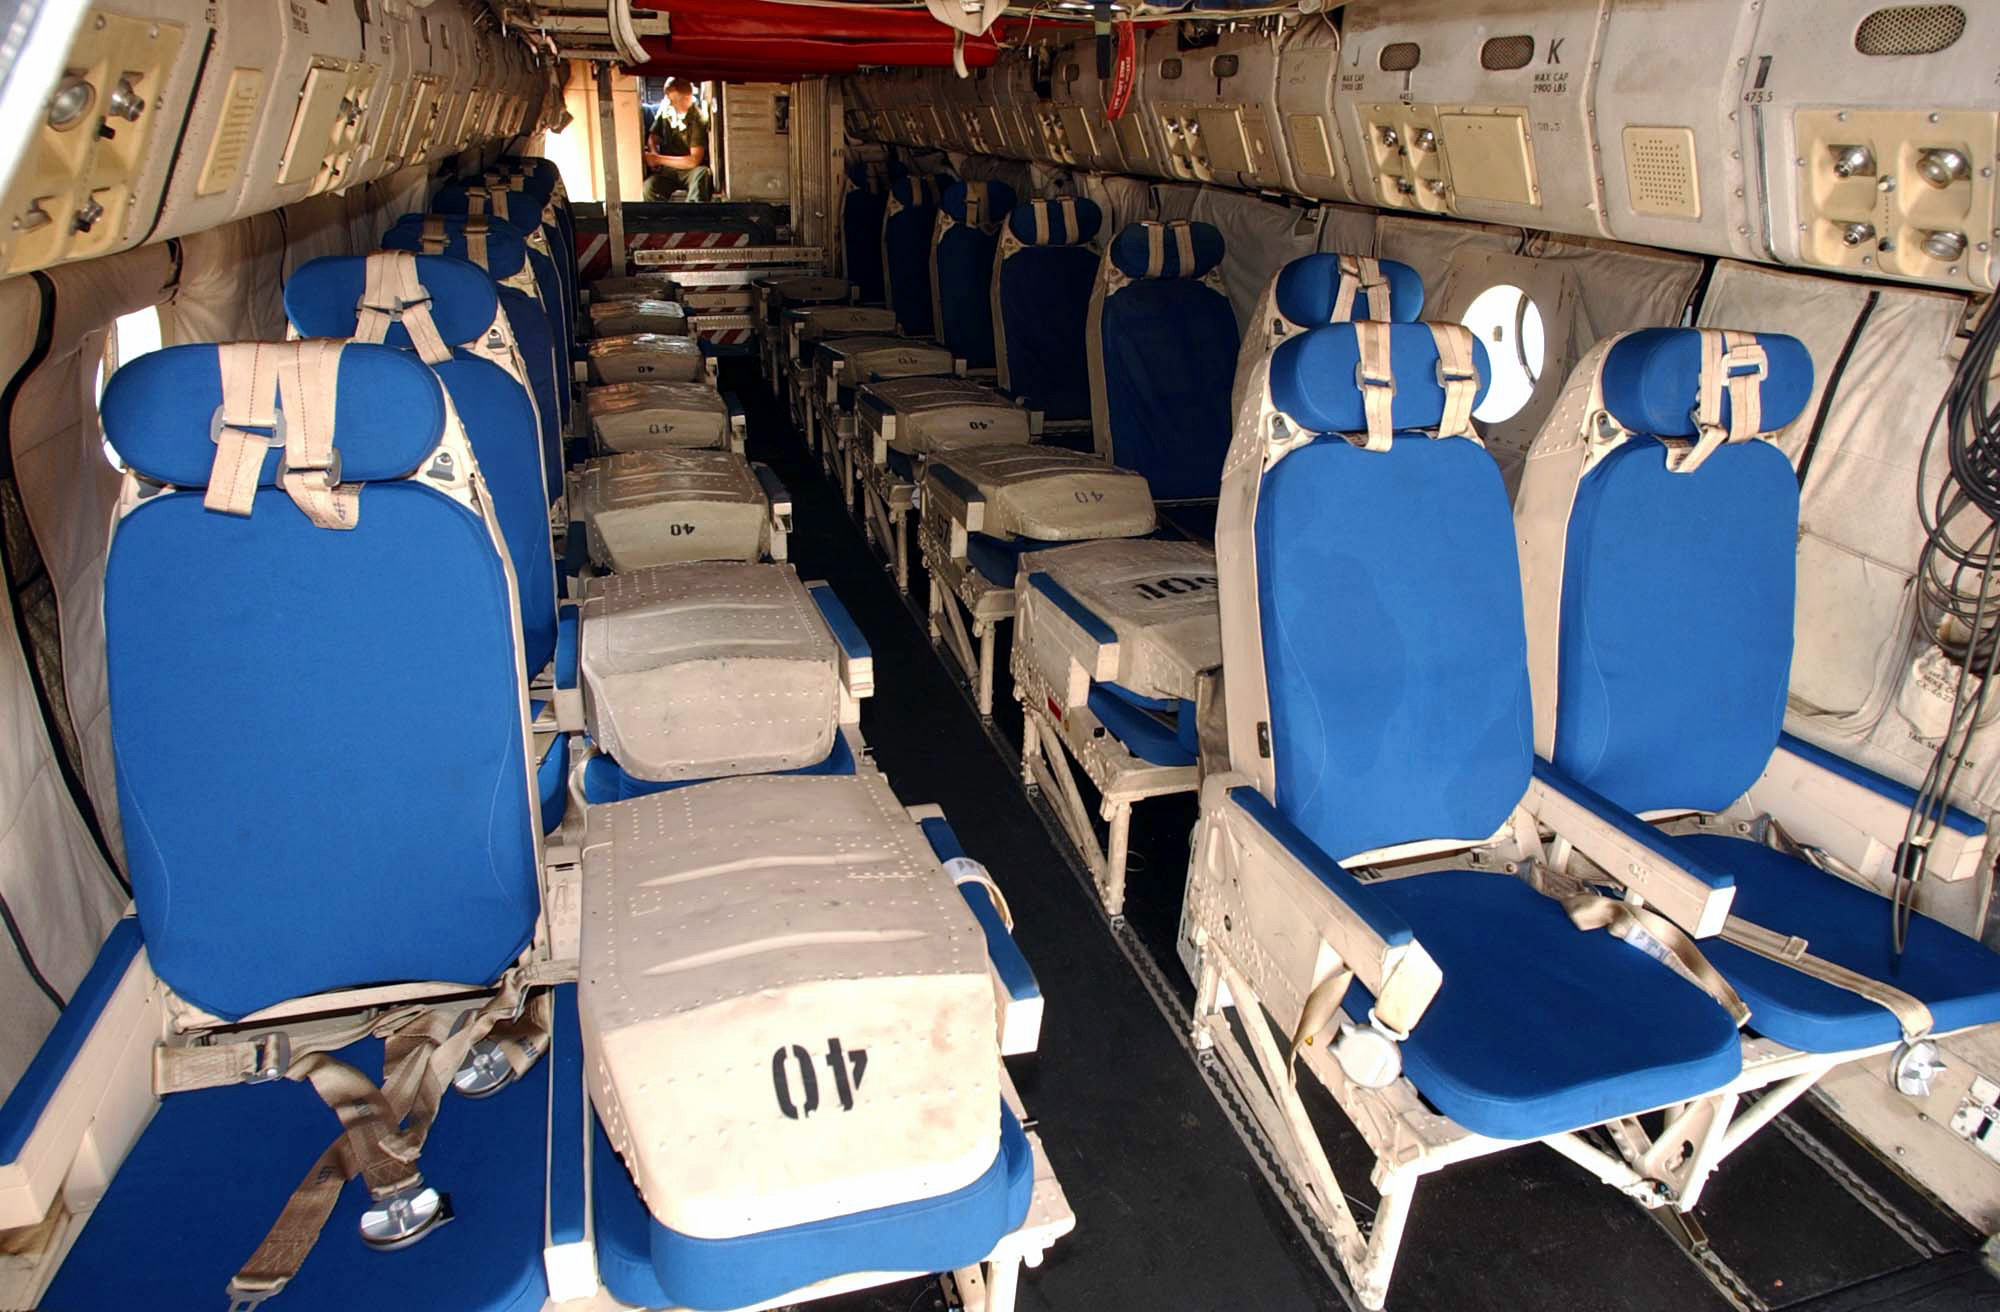 C 2a Greyhound Logistics Aircraft File:C-2A interior DN-...